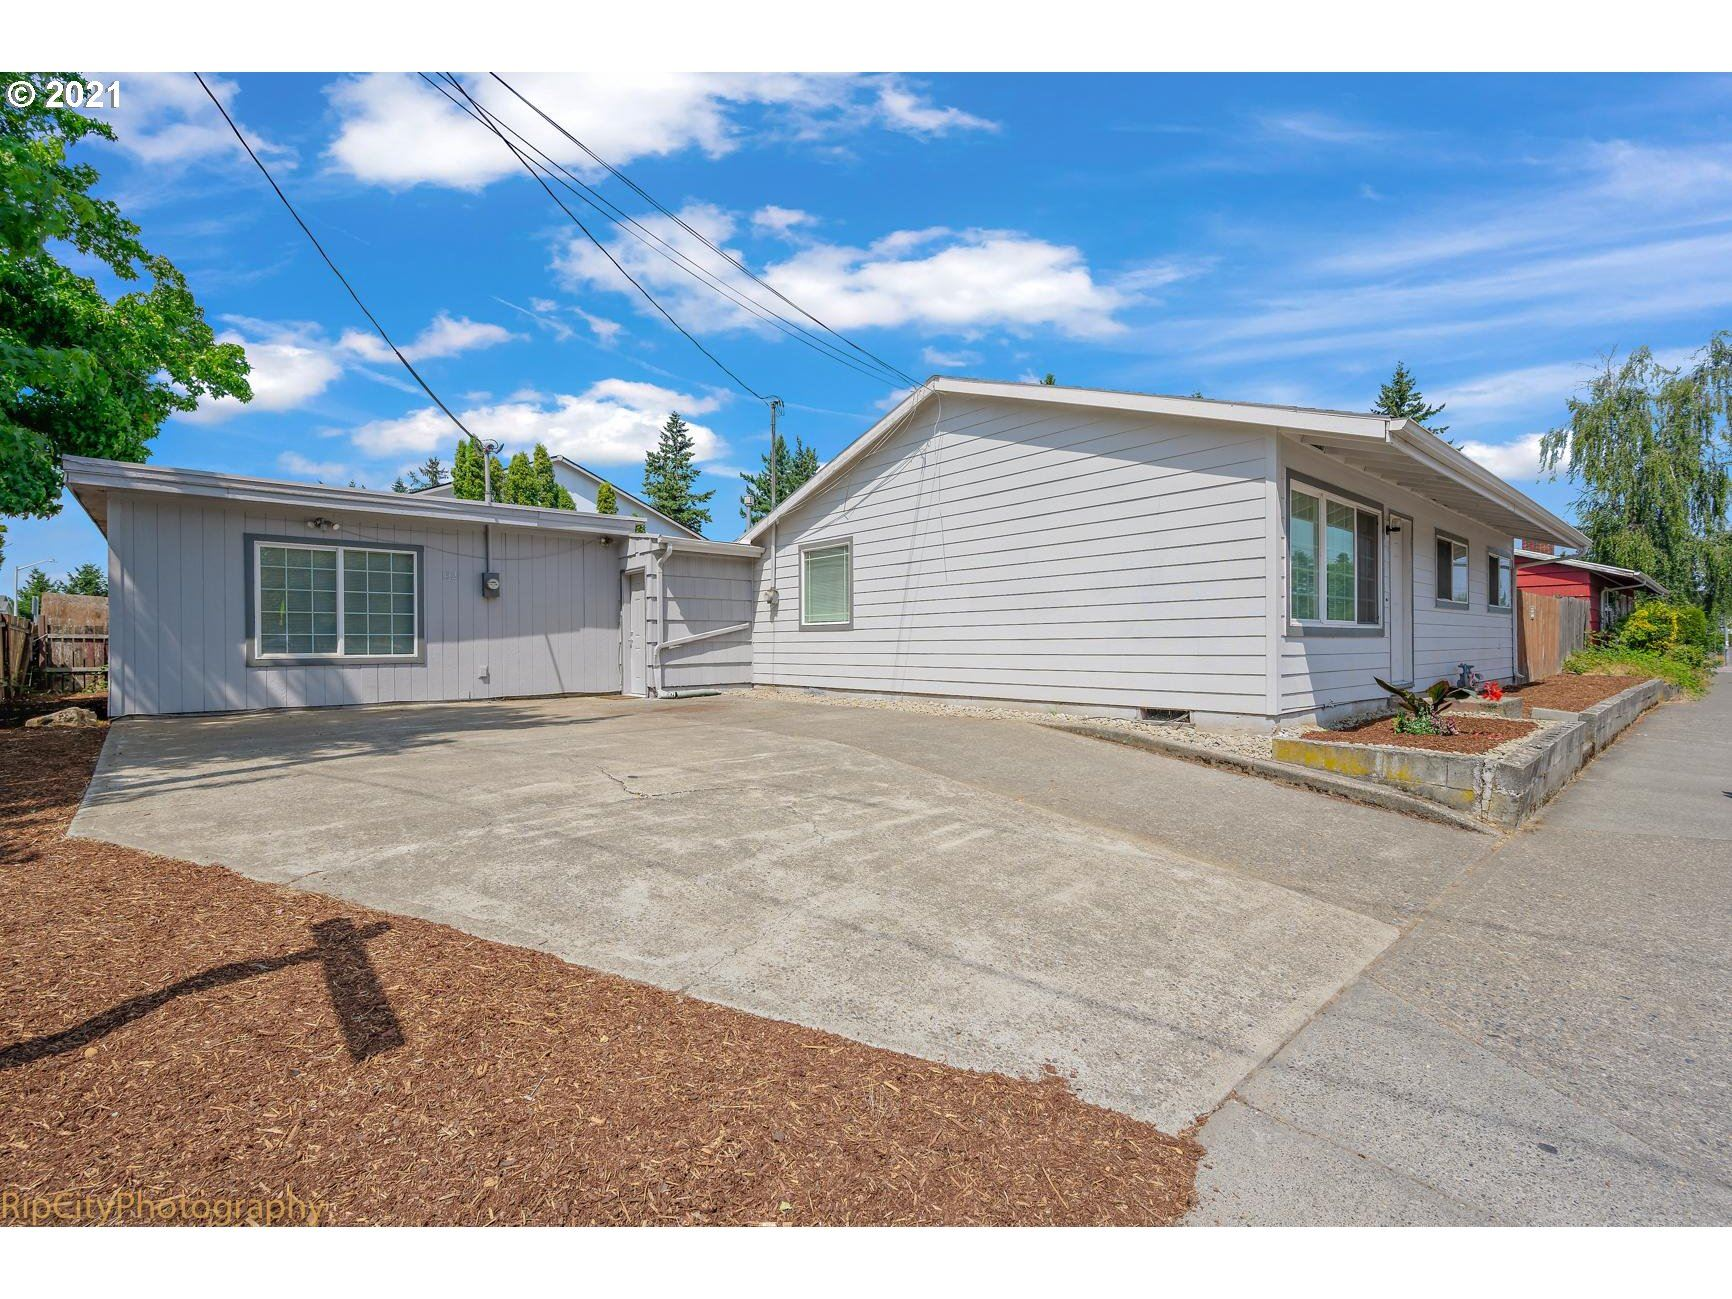 1327 SE 182ND AVE, Portland, OR 97233 - MLS#: 21224066